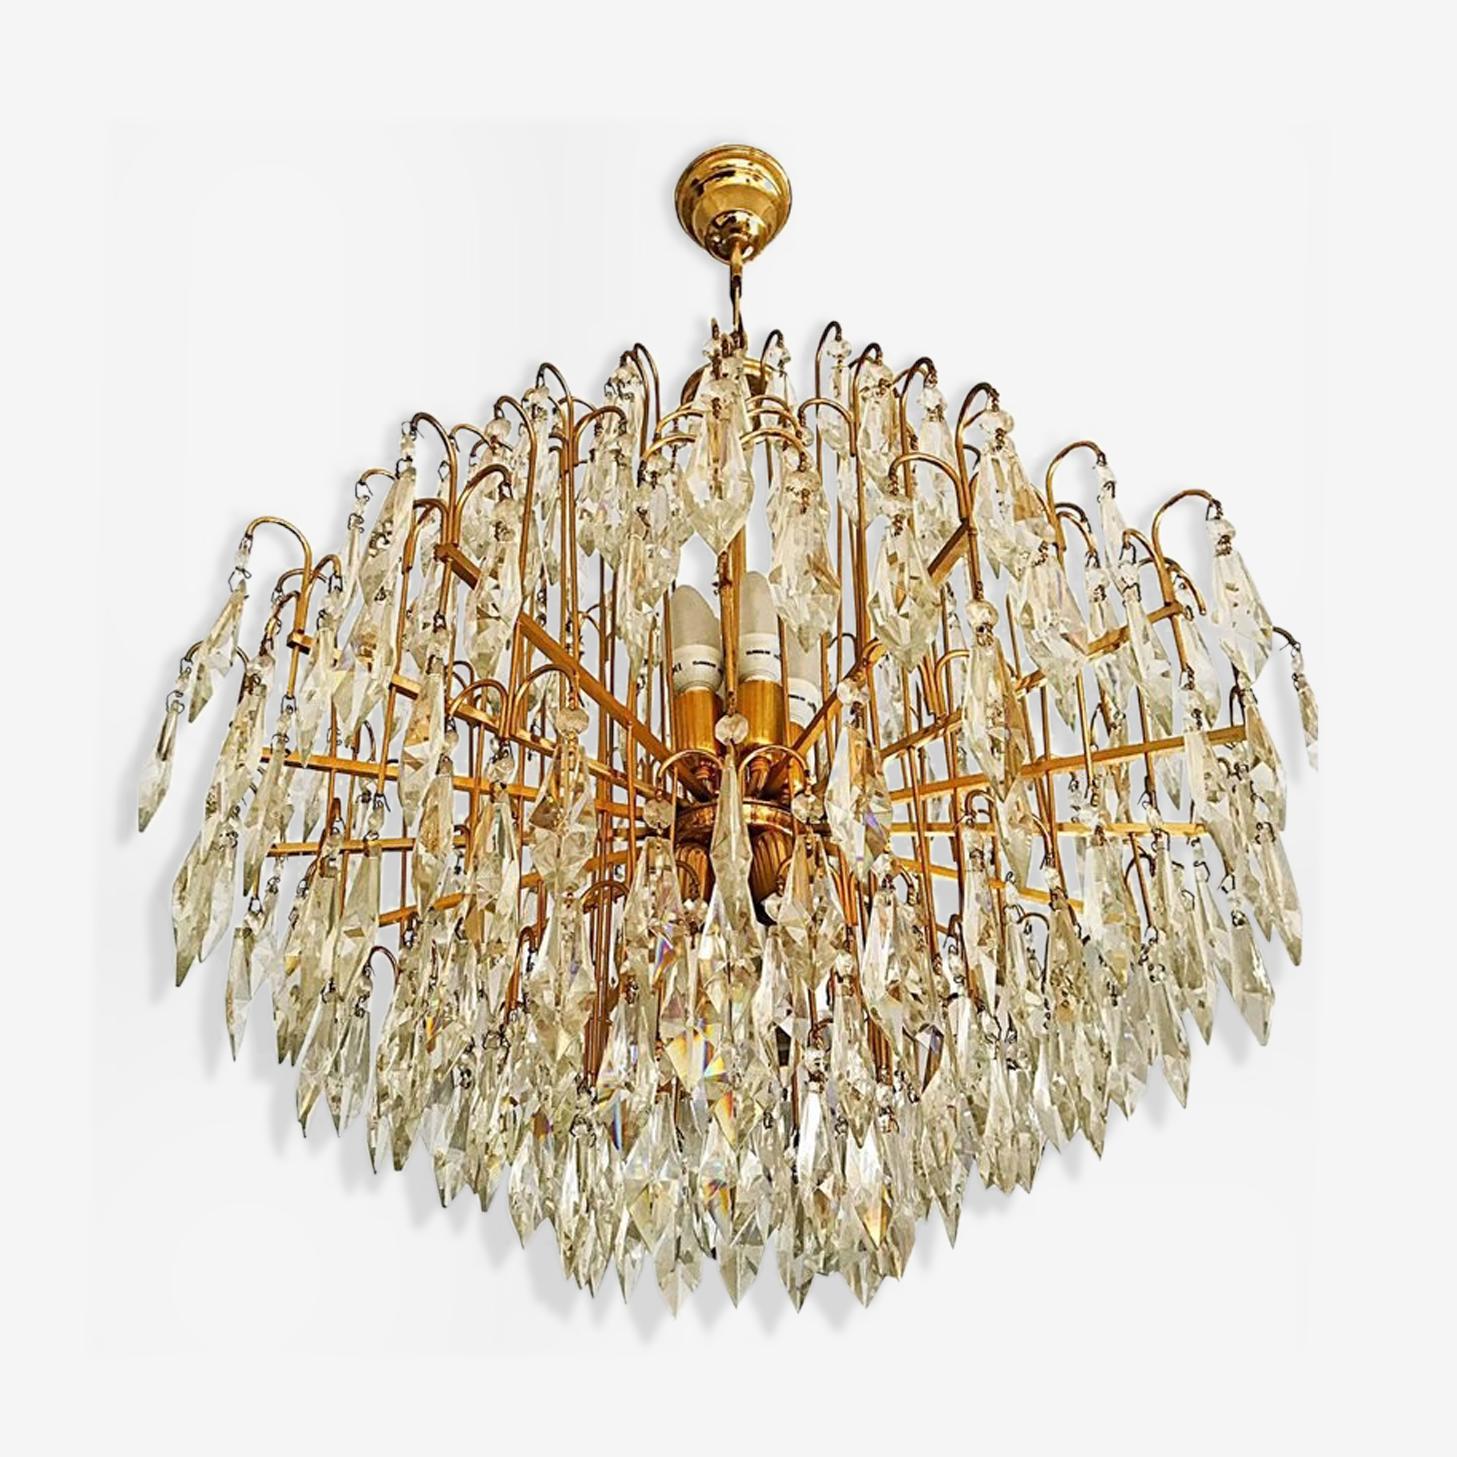 Lustre en cristal de Murano Italie cadre en laiton plaqué or 1970